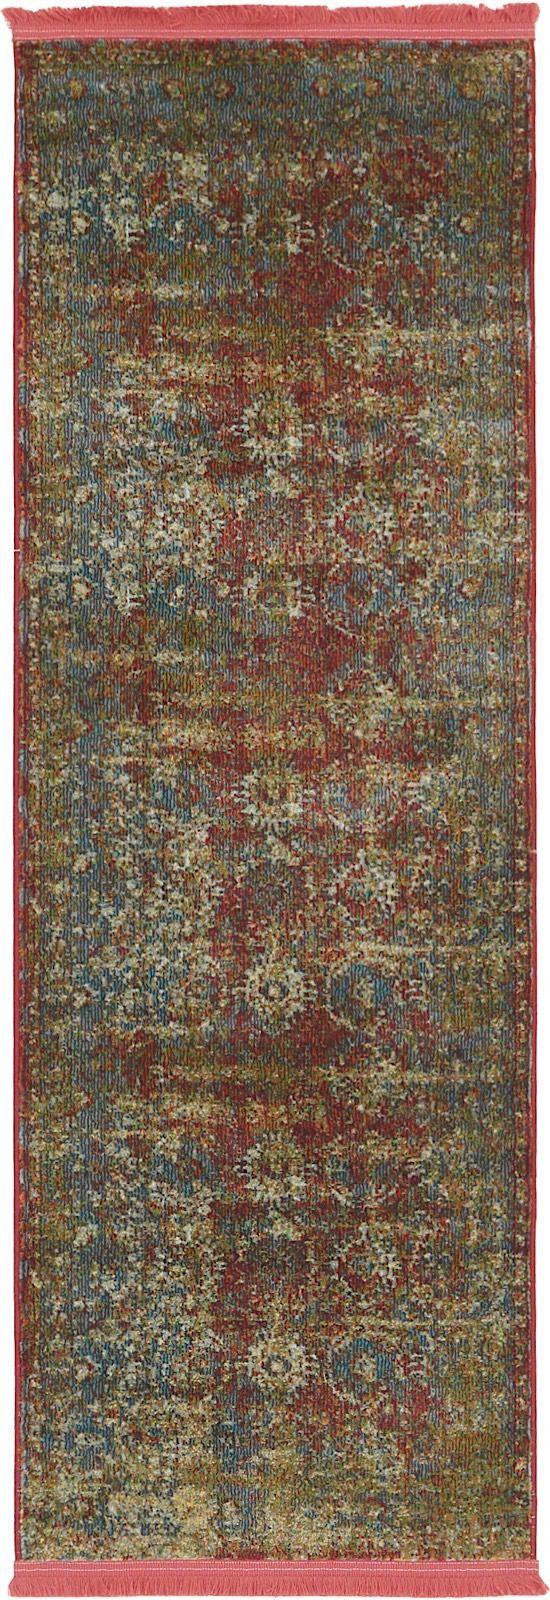 rugpal varadero traditional area rug collection